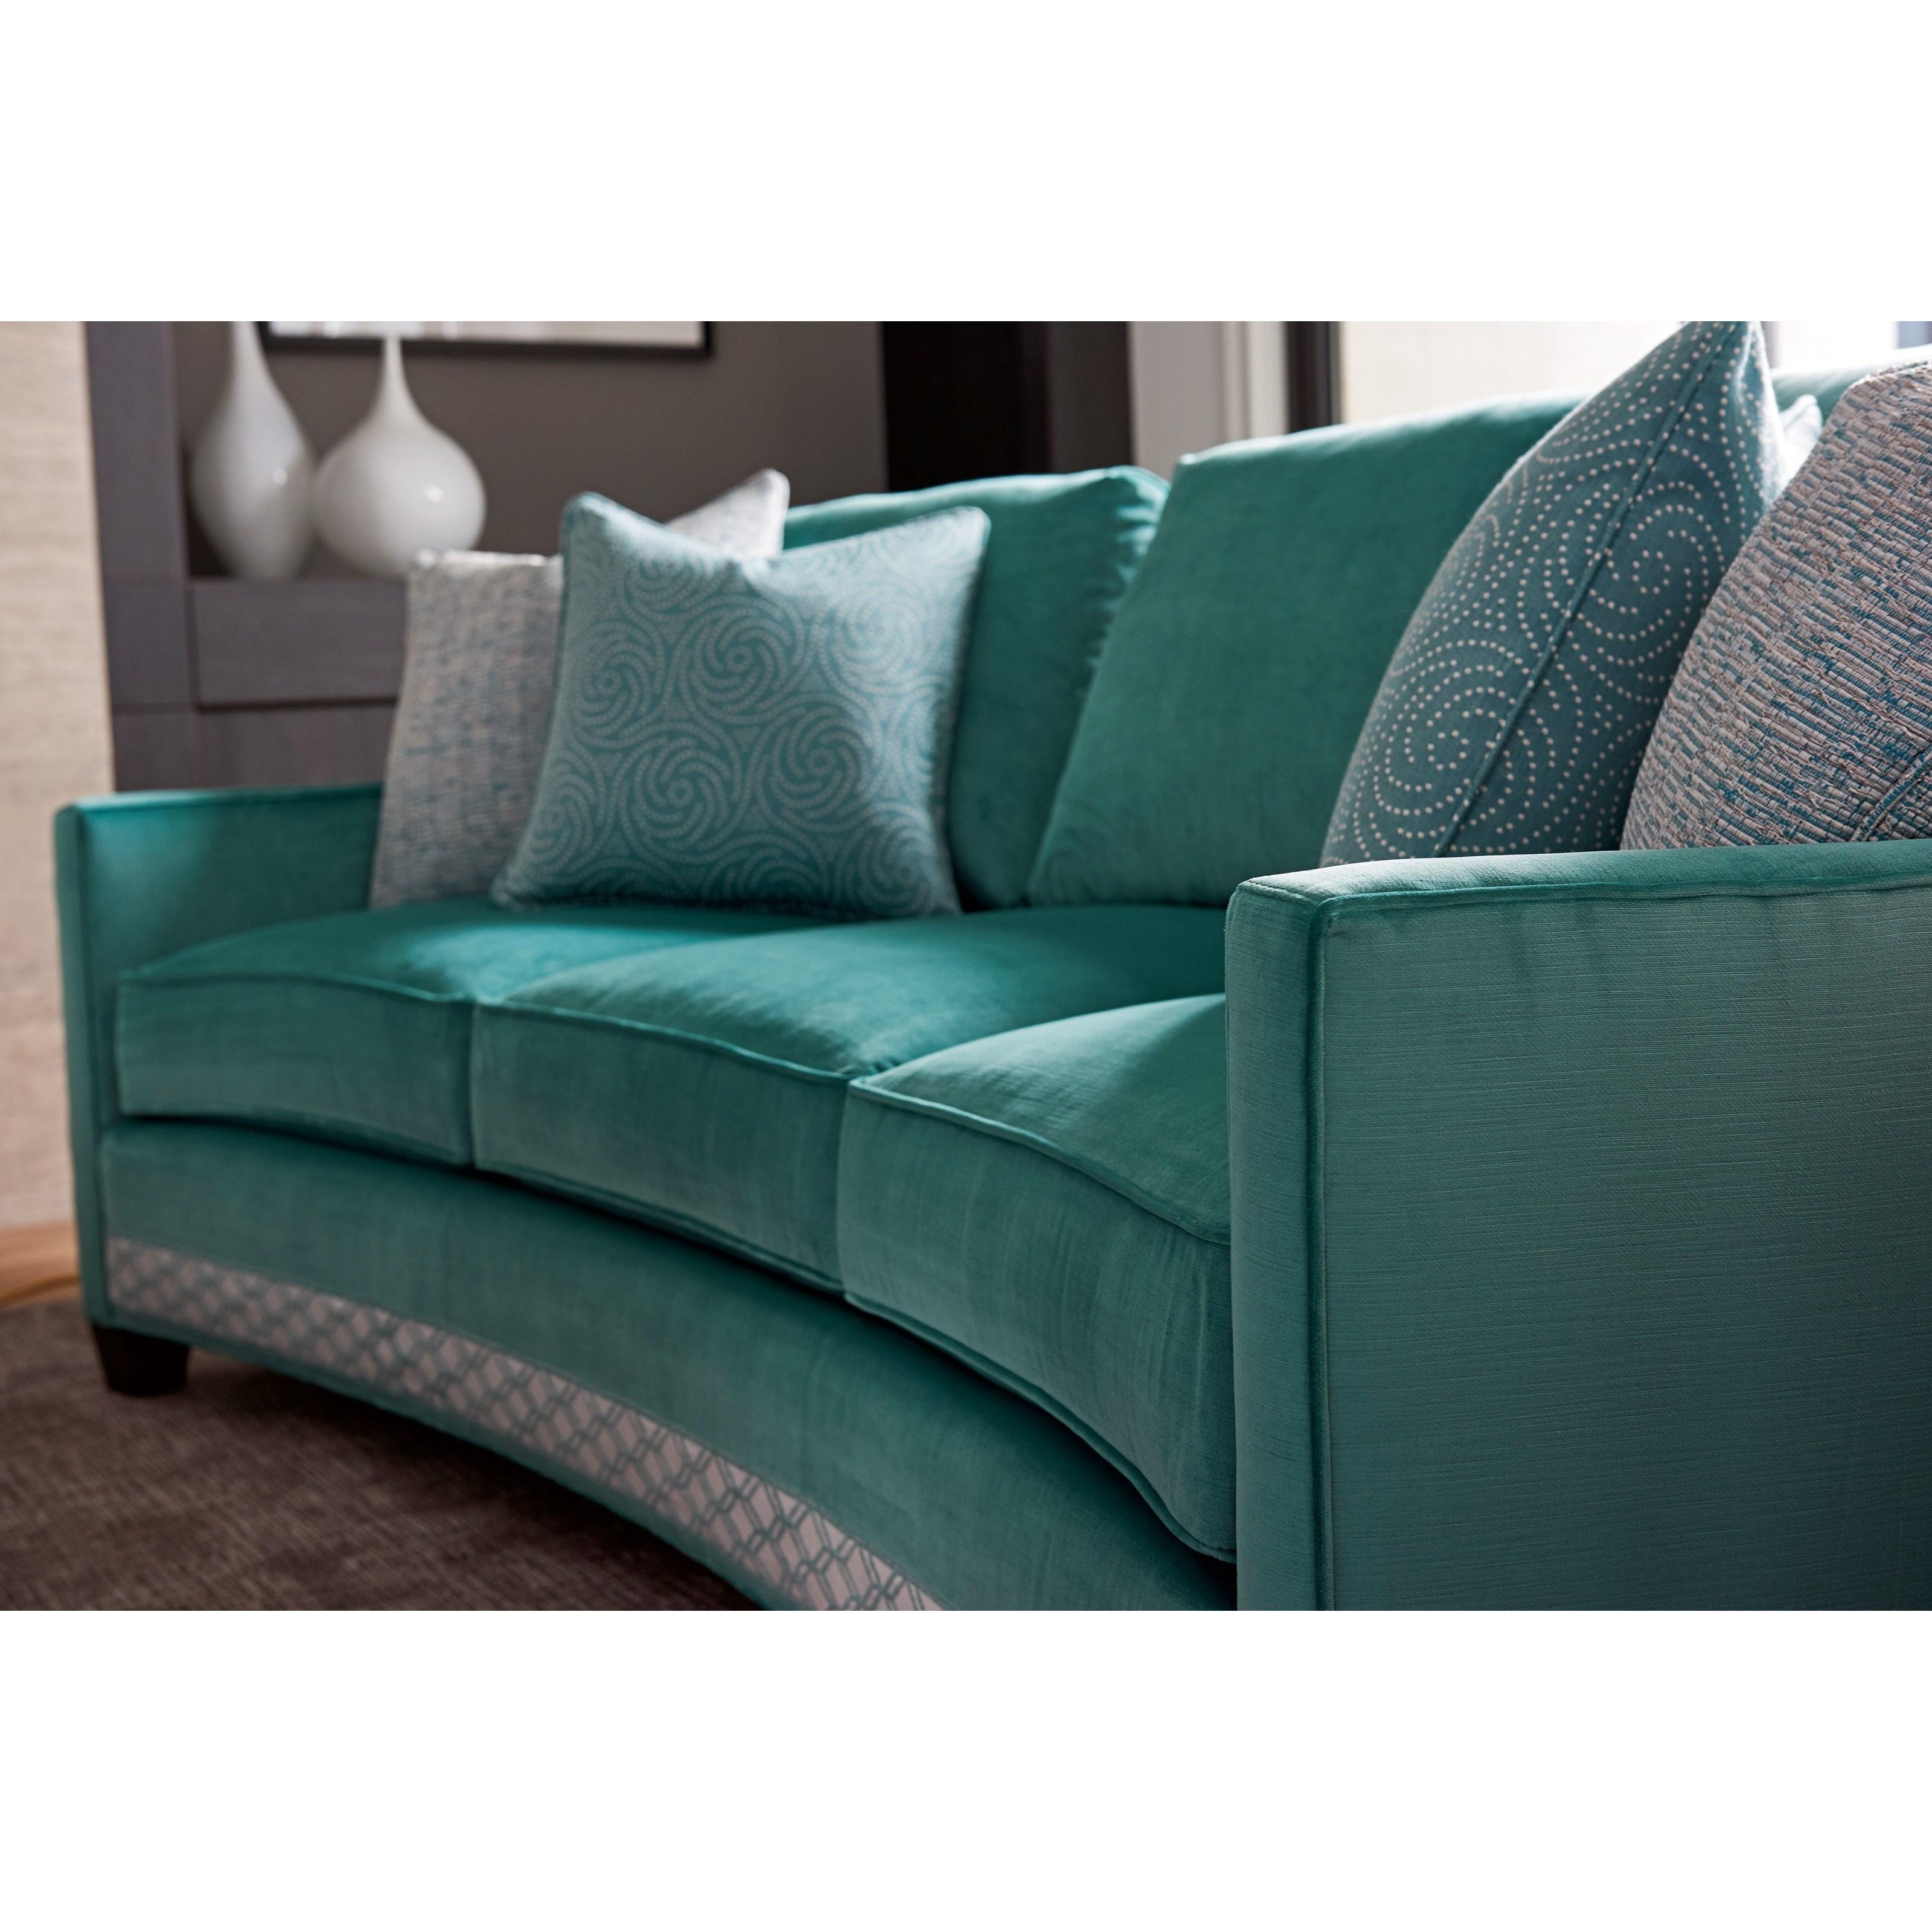 Lexington Ariana 7931 33 Valenza Curved Sofa Baer S